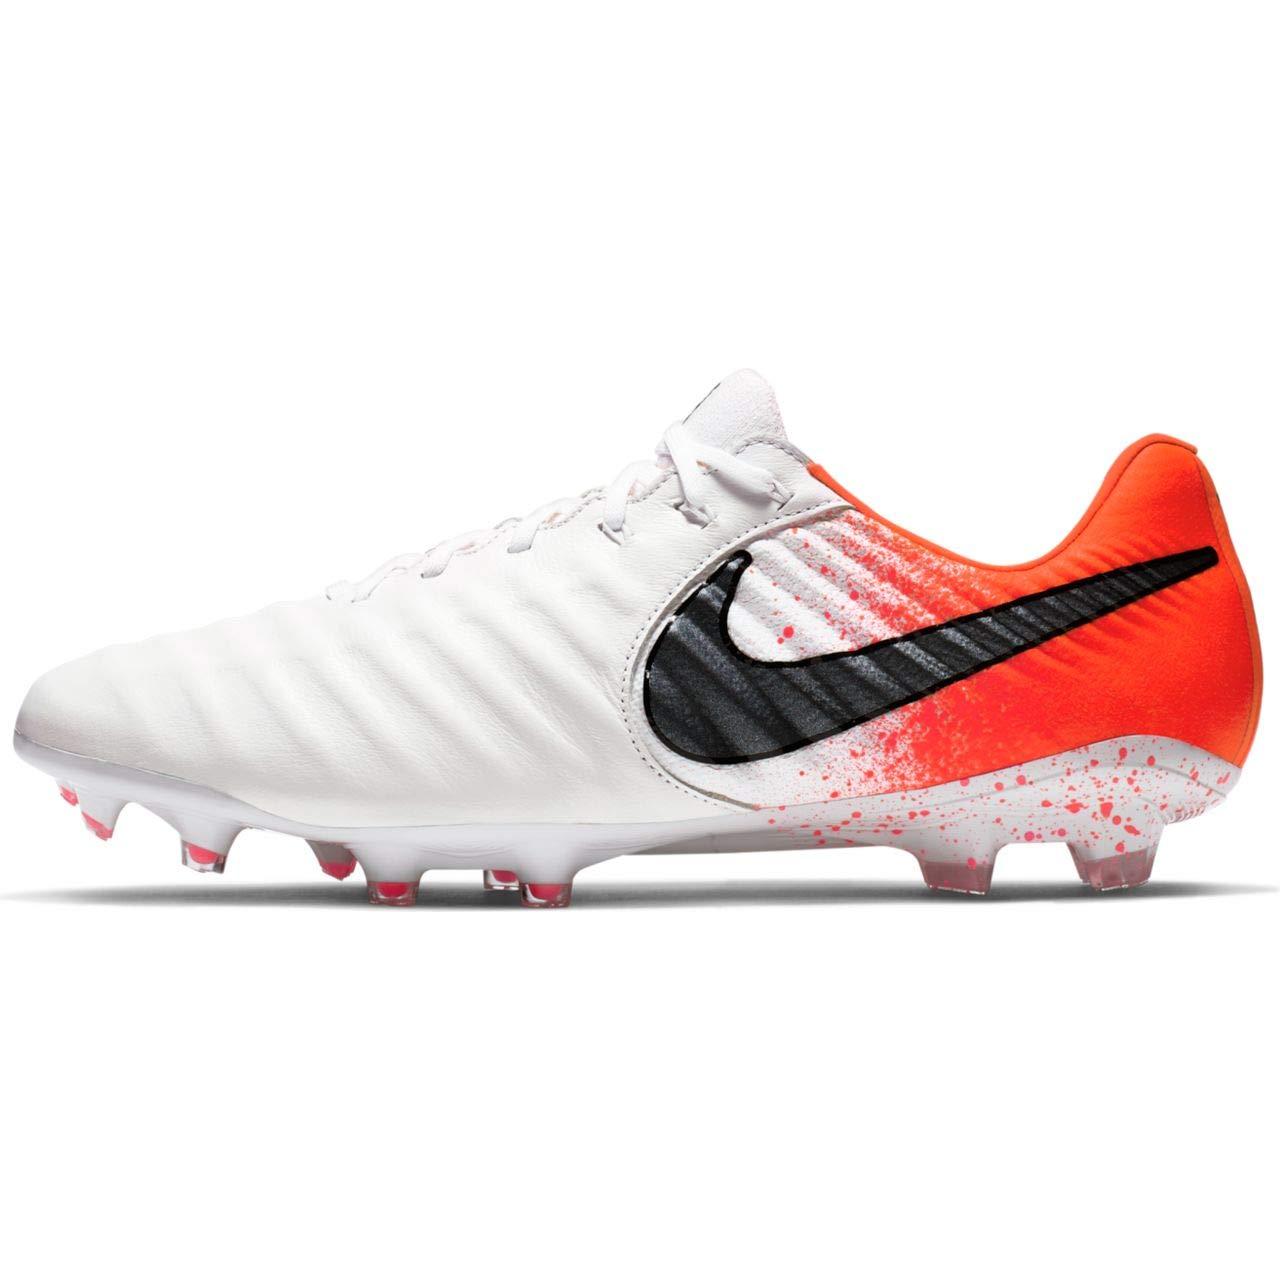 save off 08e15 a67de Nike Men's Legend 7 Elite FG Soccer Cleat (White, Black, Hyper Crimson)